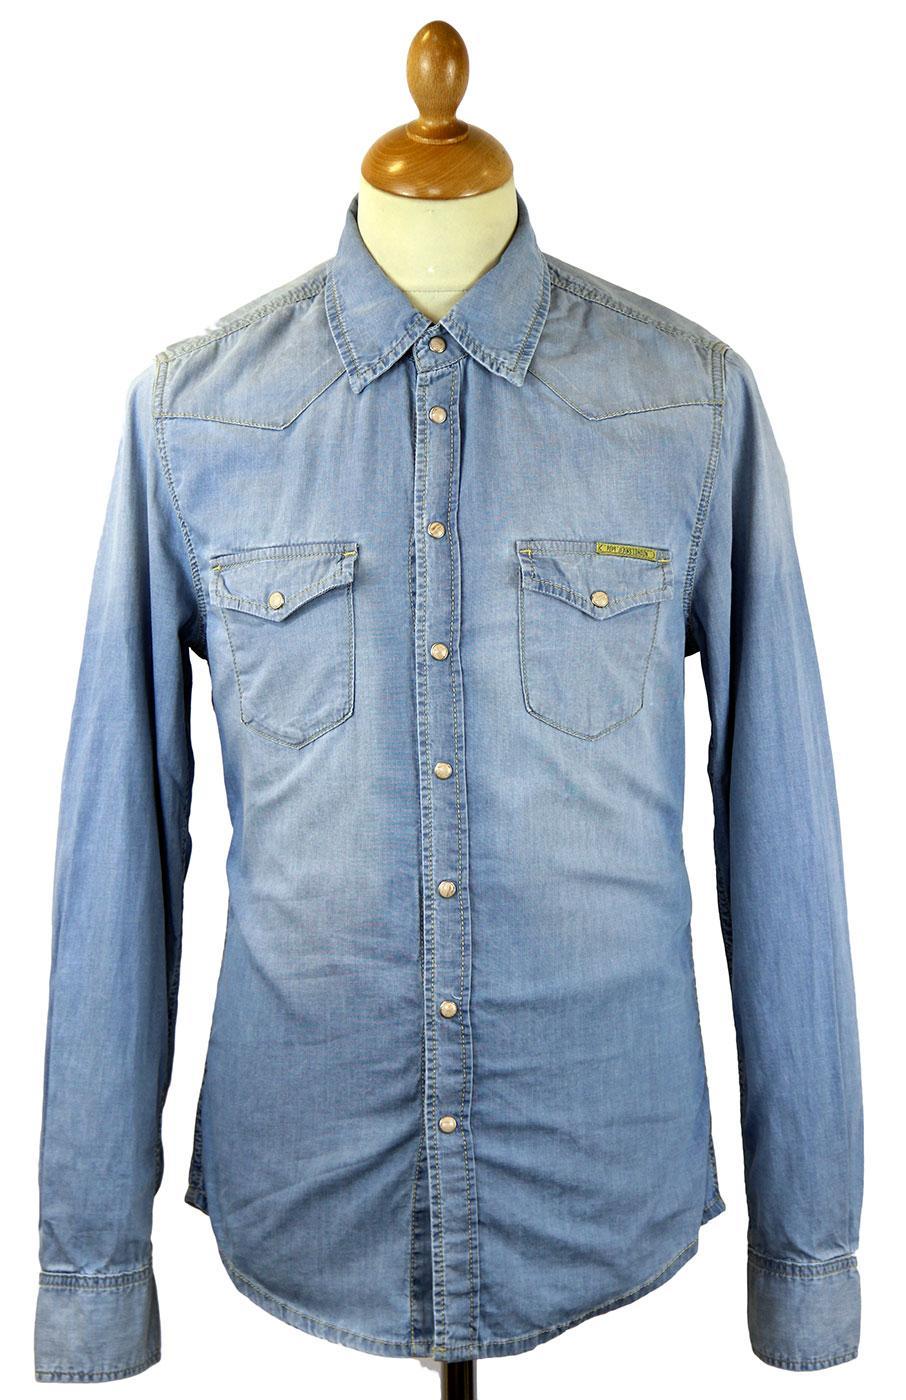 Carson PEPE JEANS Retro 70s Indie Denim Shirt (DD)